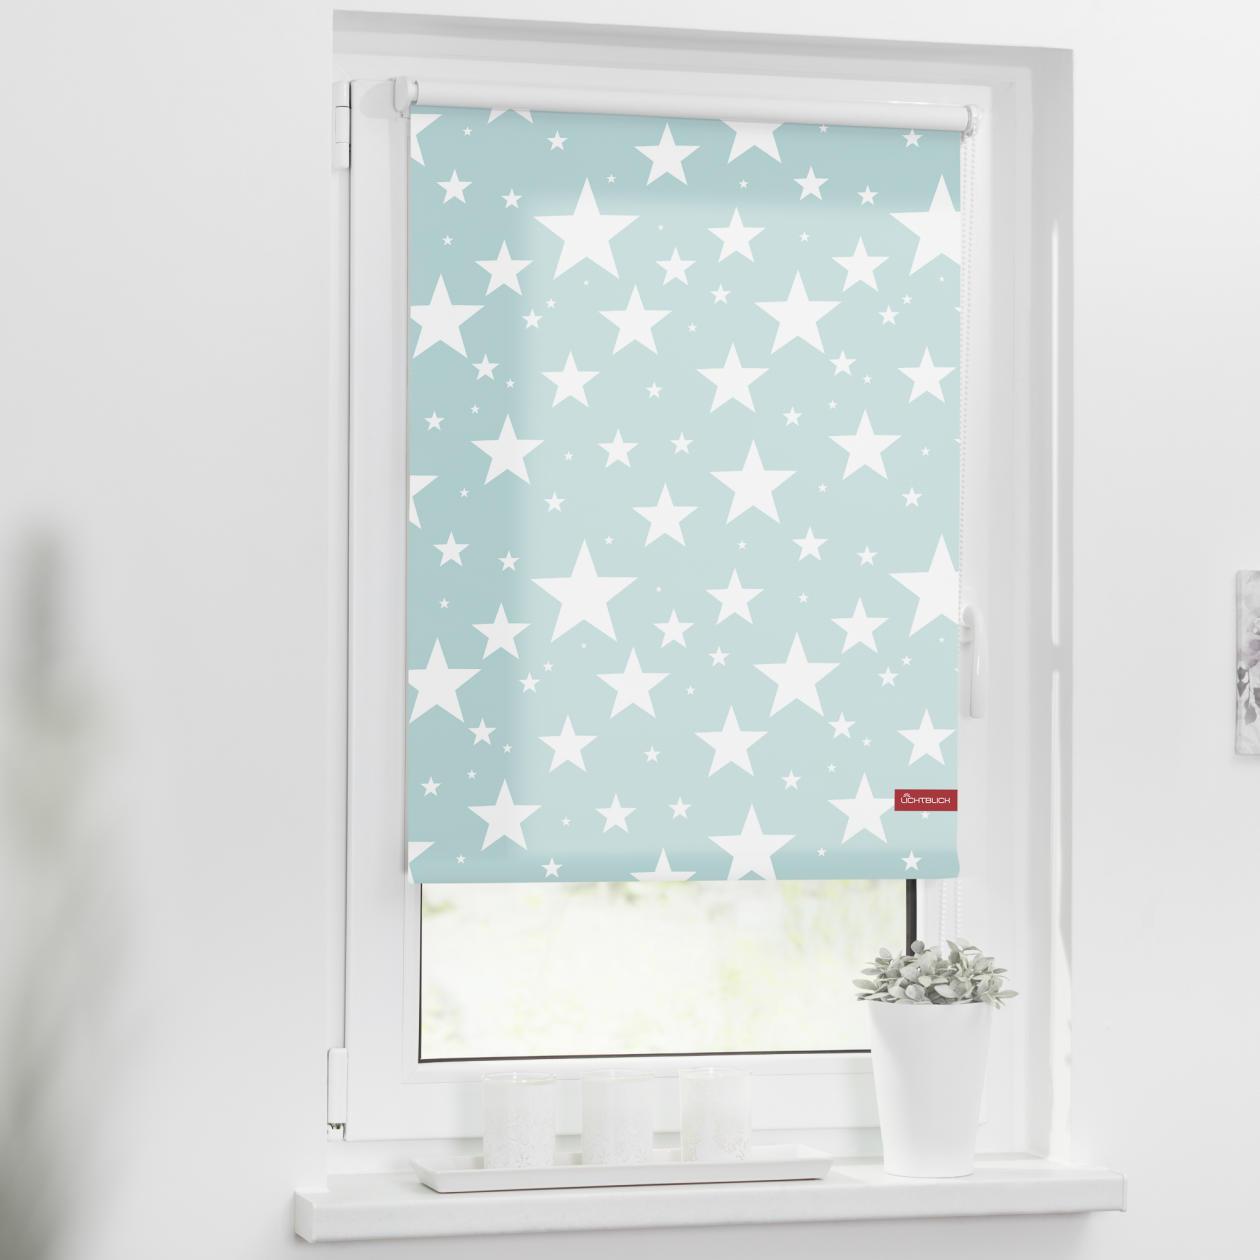 rollo klemmfix ohne bohren blickdicht sterne blau lichblick shop. Black Bedroom Furniture Sets. Home Design Ideas